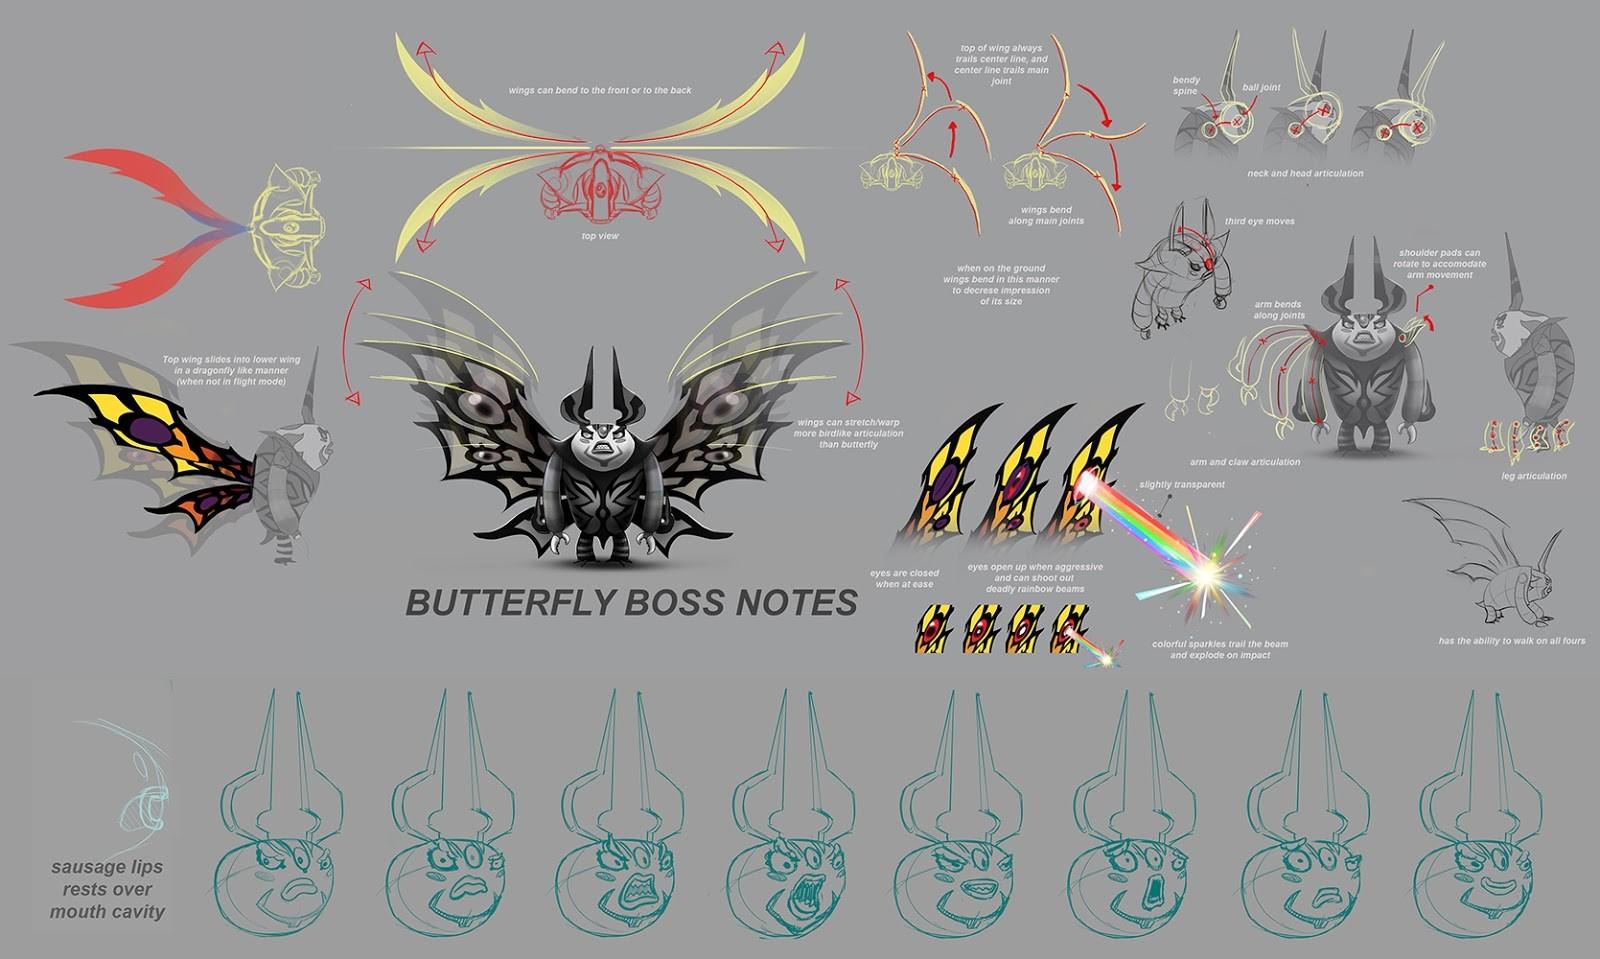 Jose cua butterfly boss notes